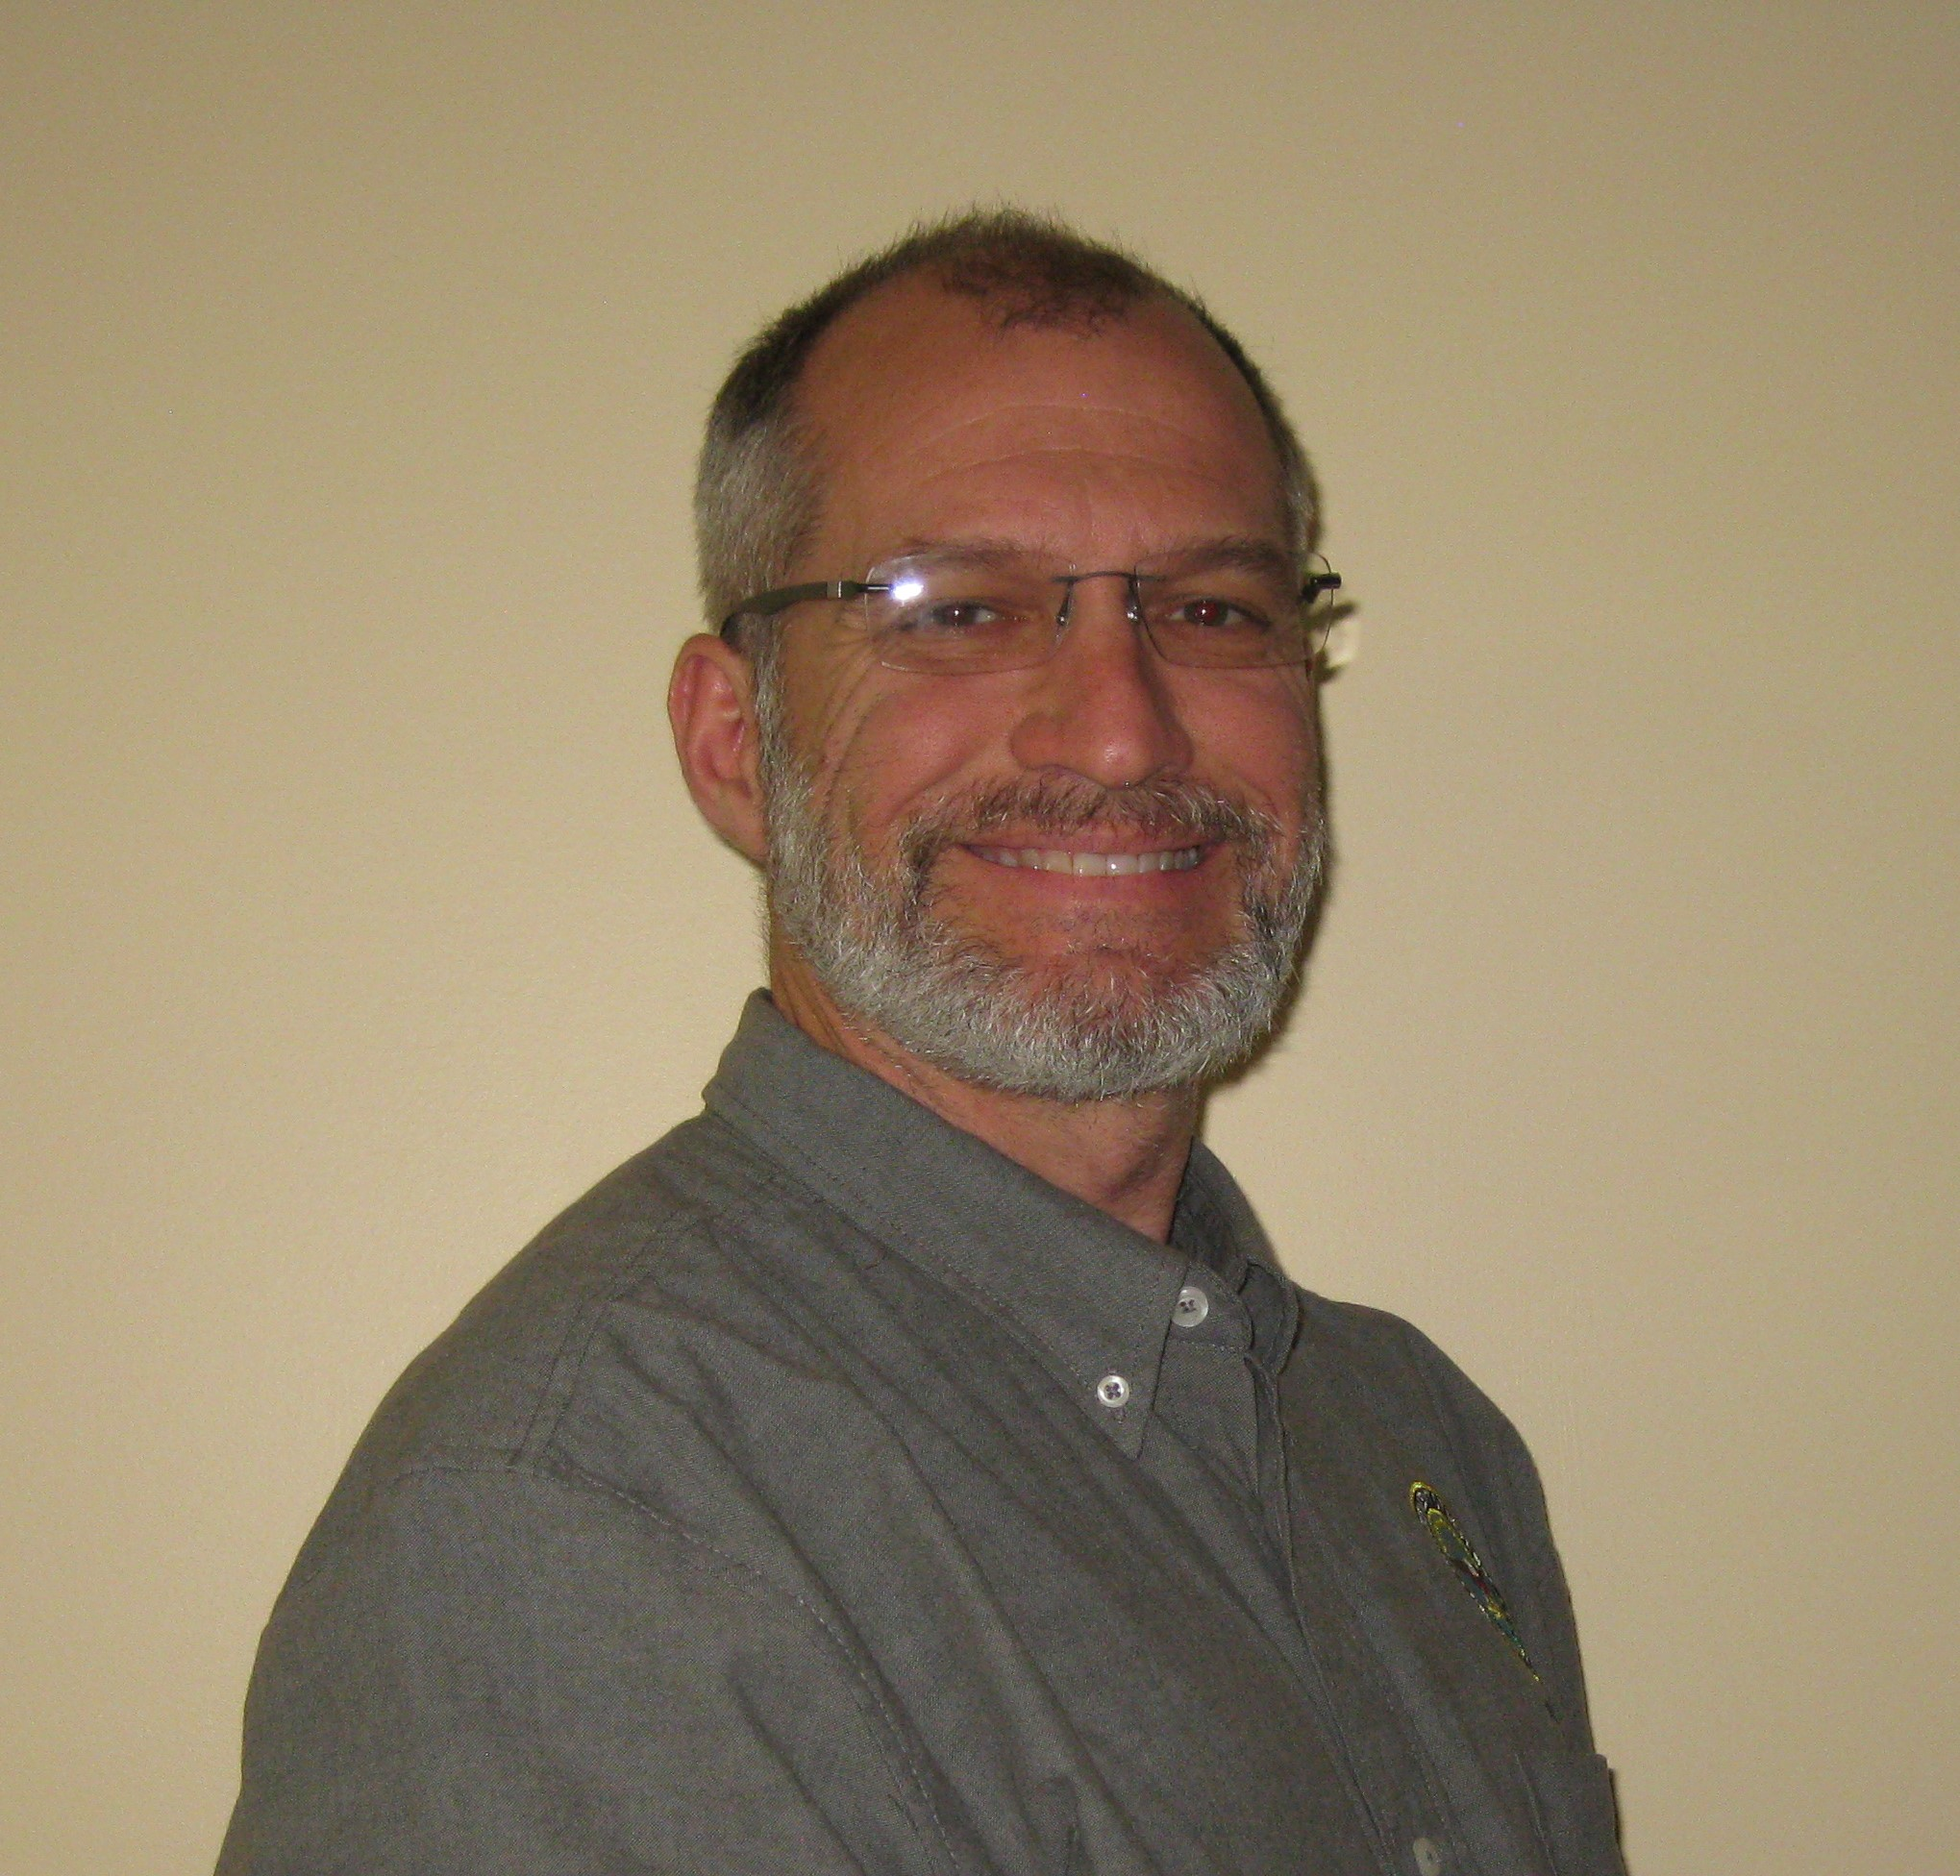 PASTOR: Brother Tim Morgan